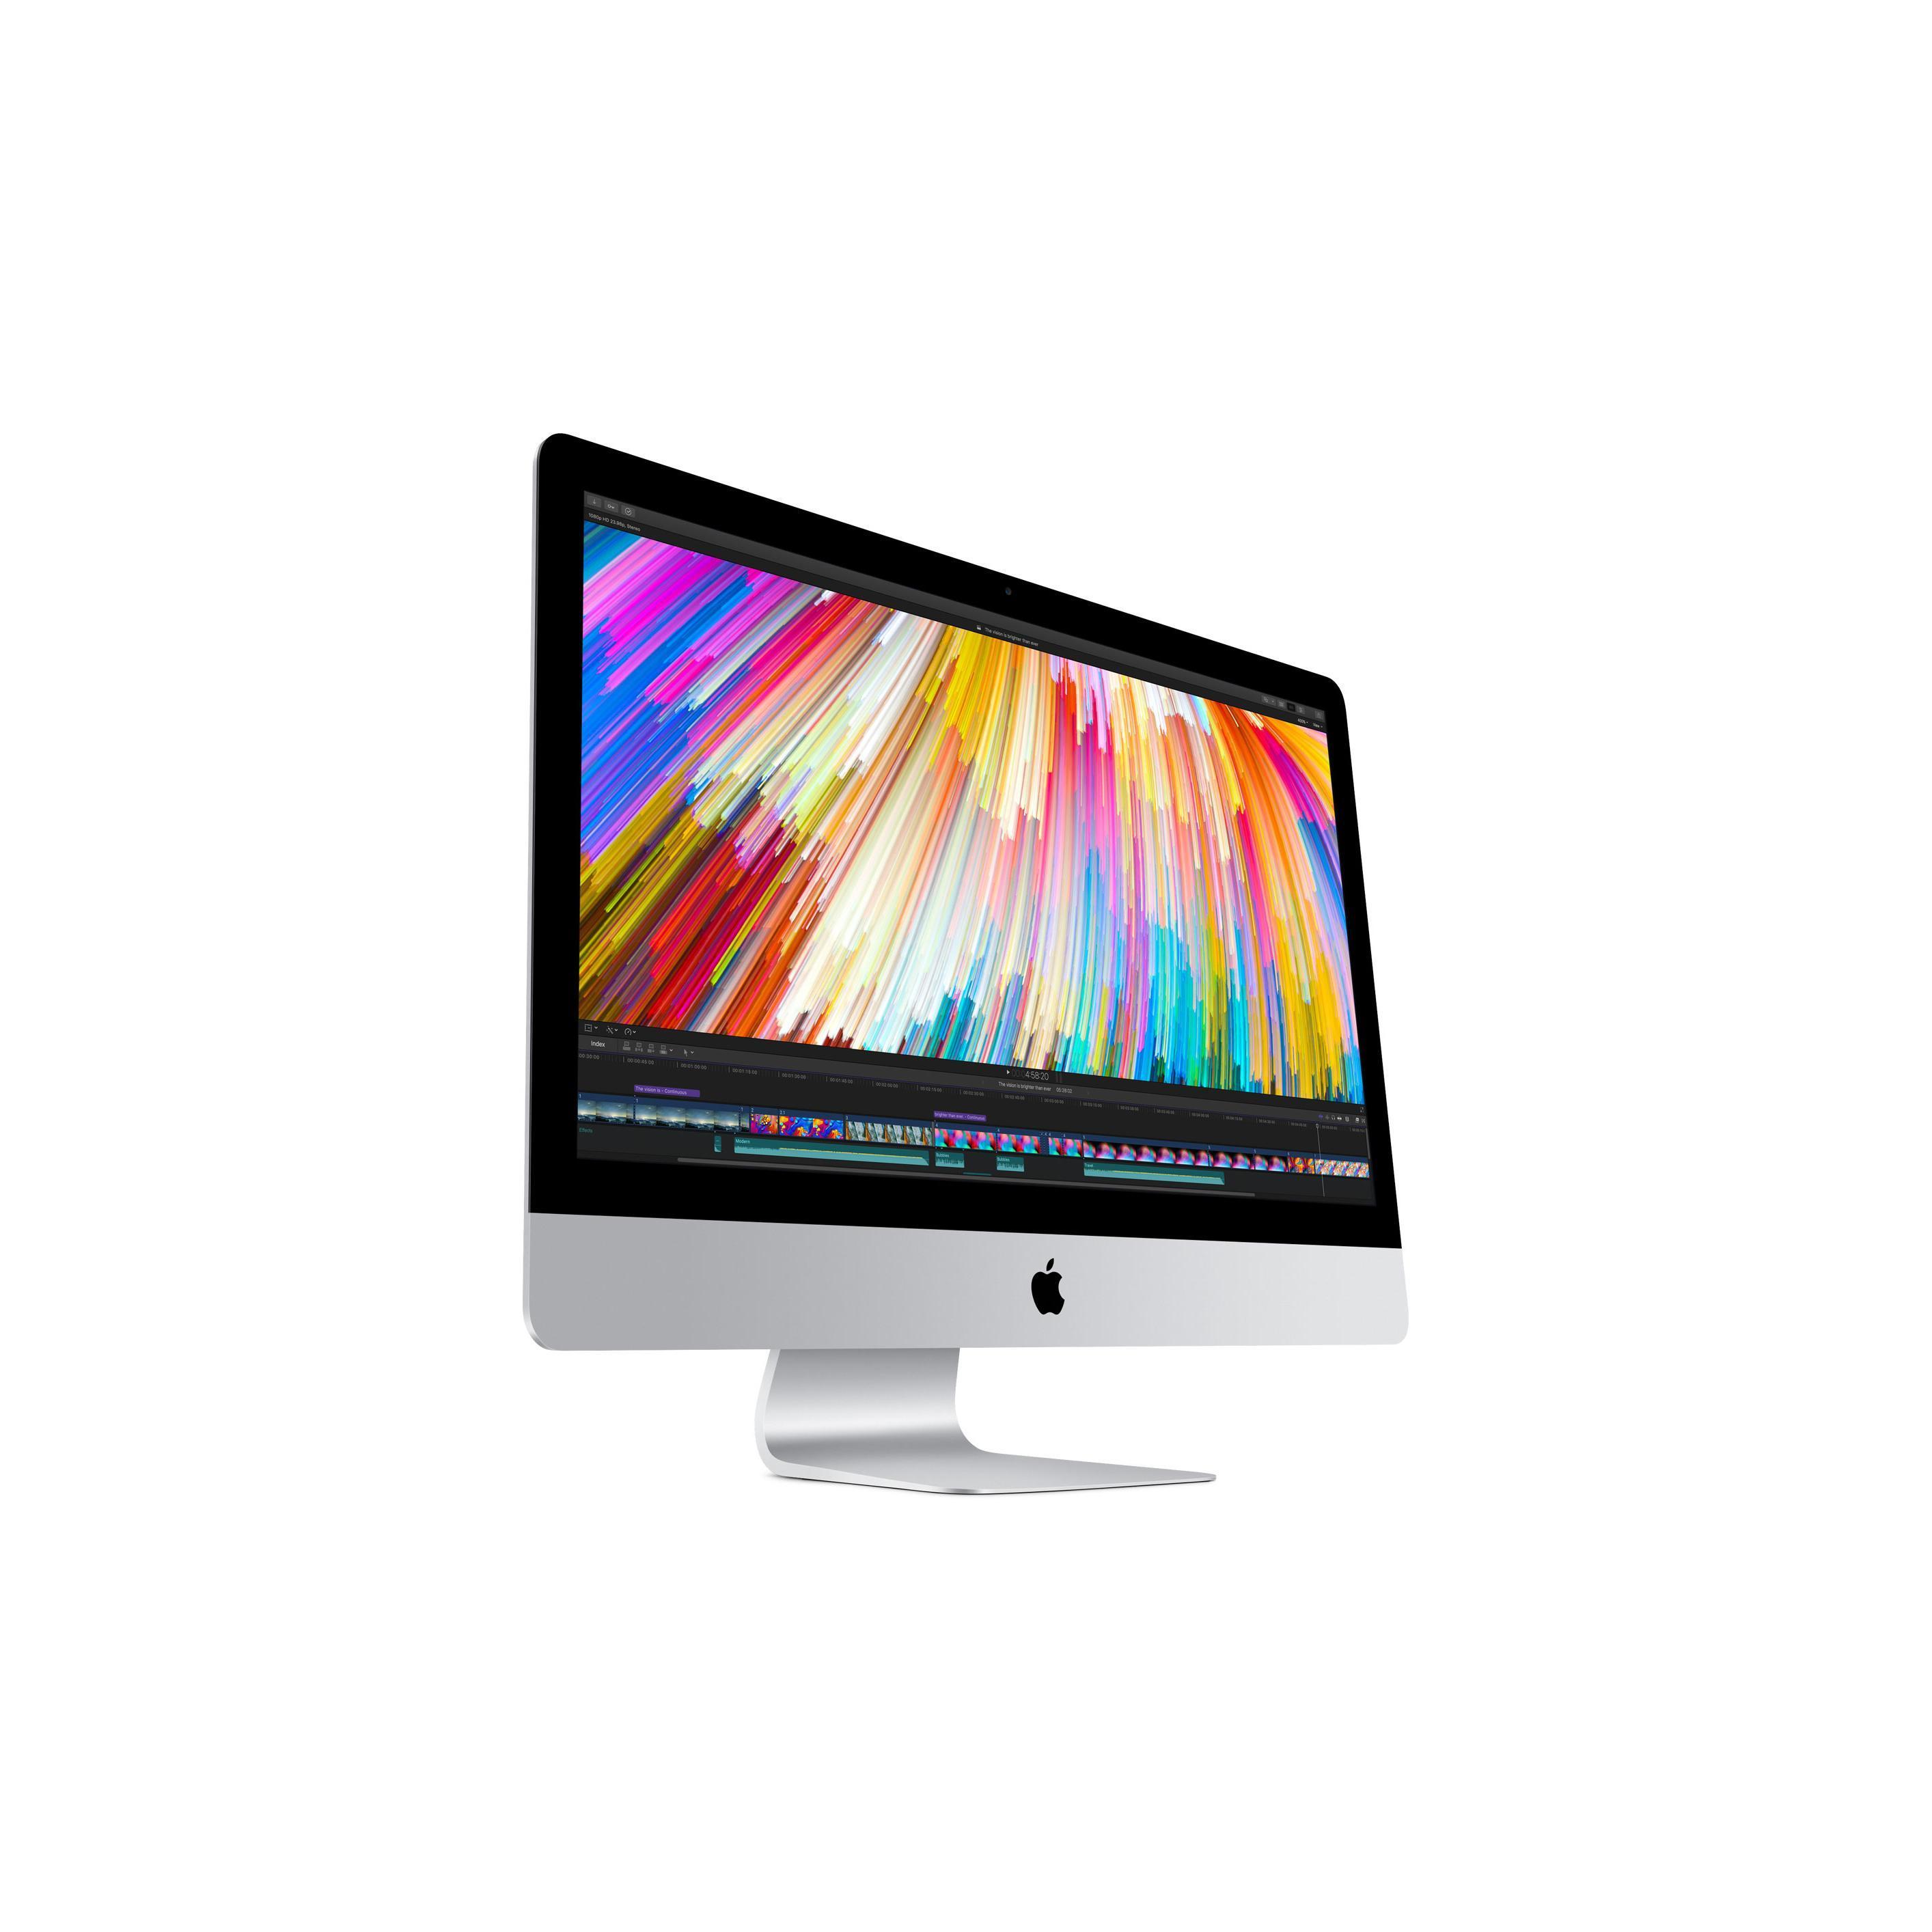 iMac 27-inch Retina (Final 2014) Core i5 3,5GHz - HDD 1 TB - 8GB AZERTY - Francês